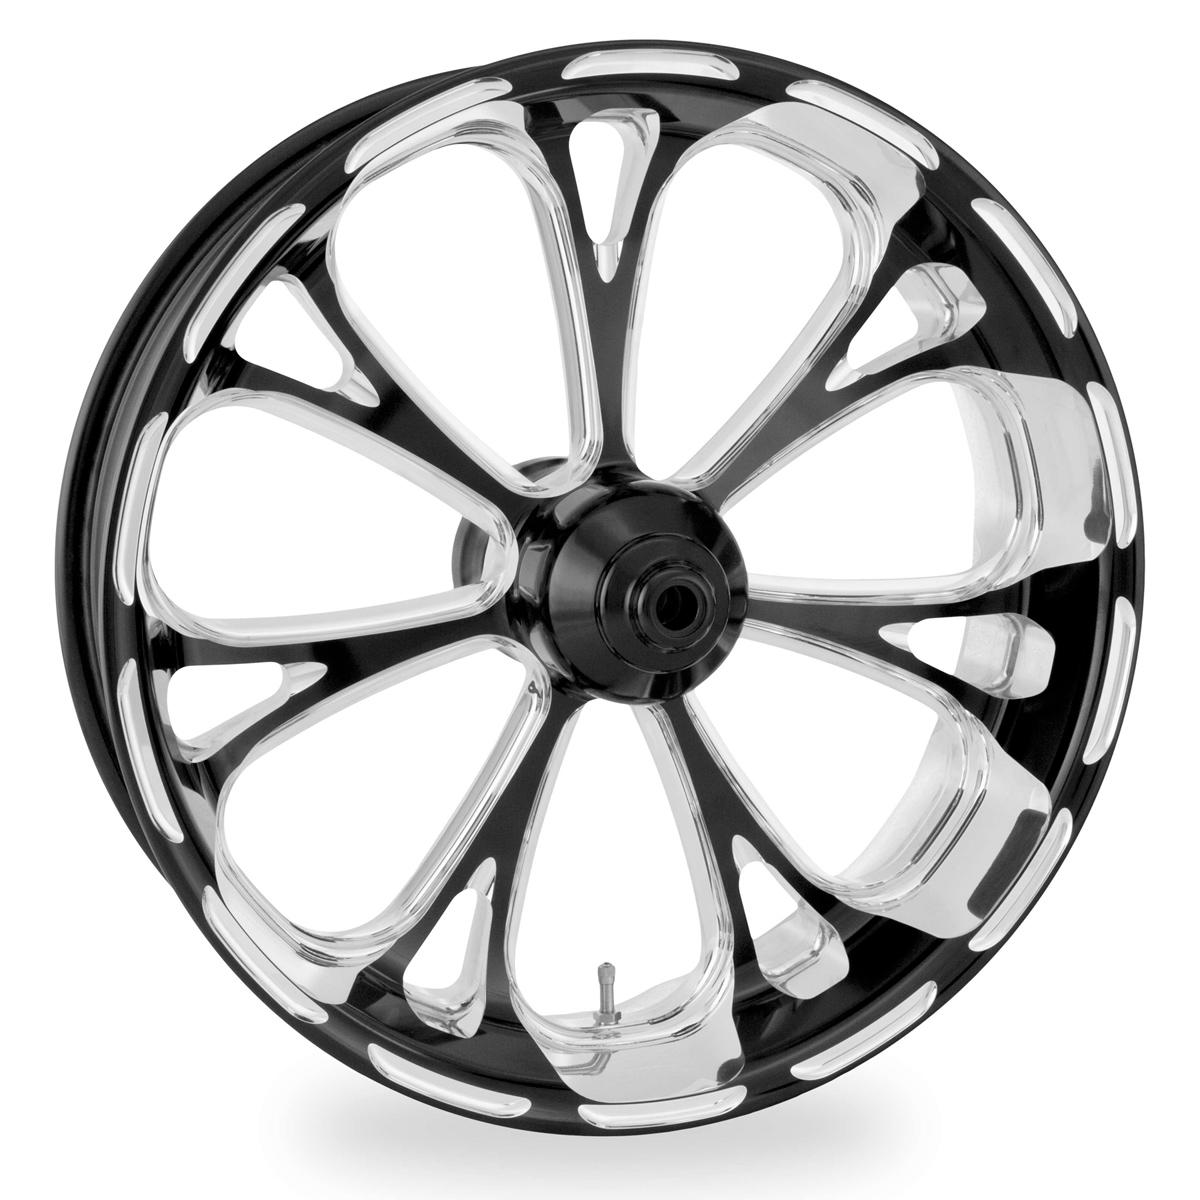 Performance Machine Virtue Platinum Cut Front Wheel 21x3.5 Non-ABS